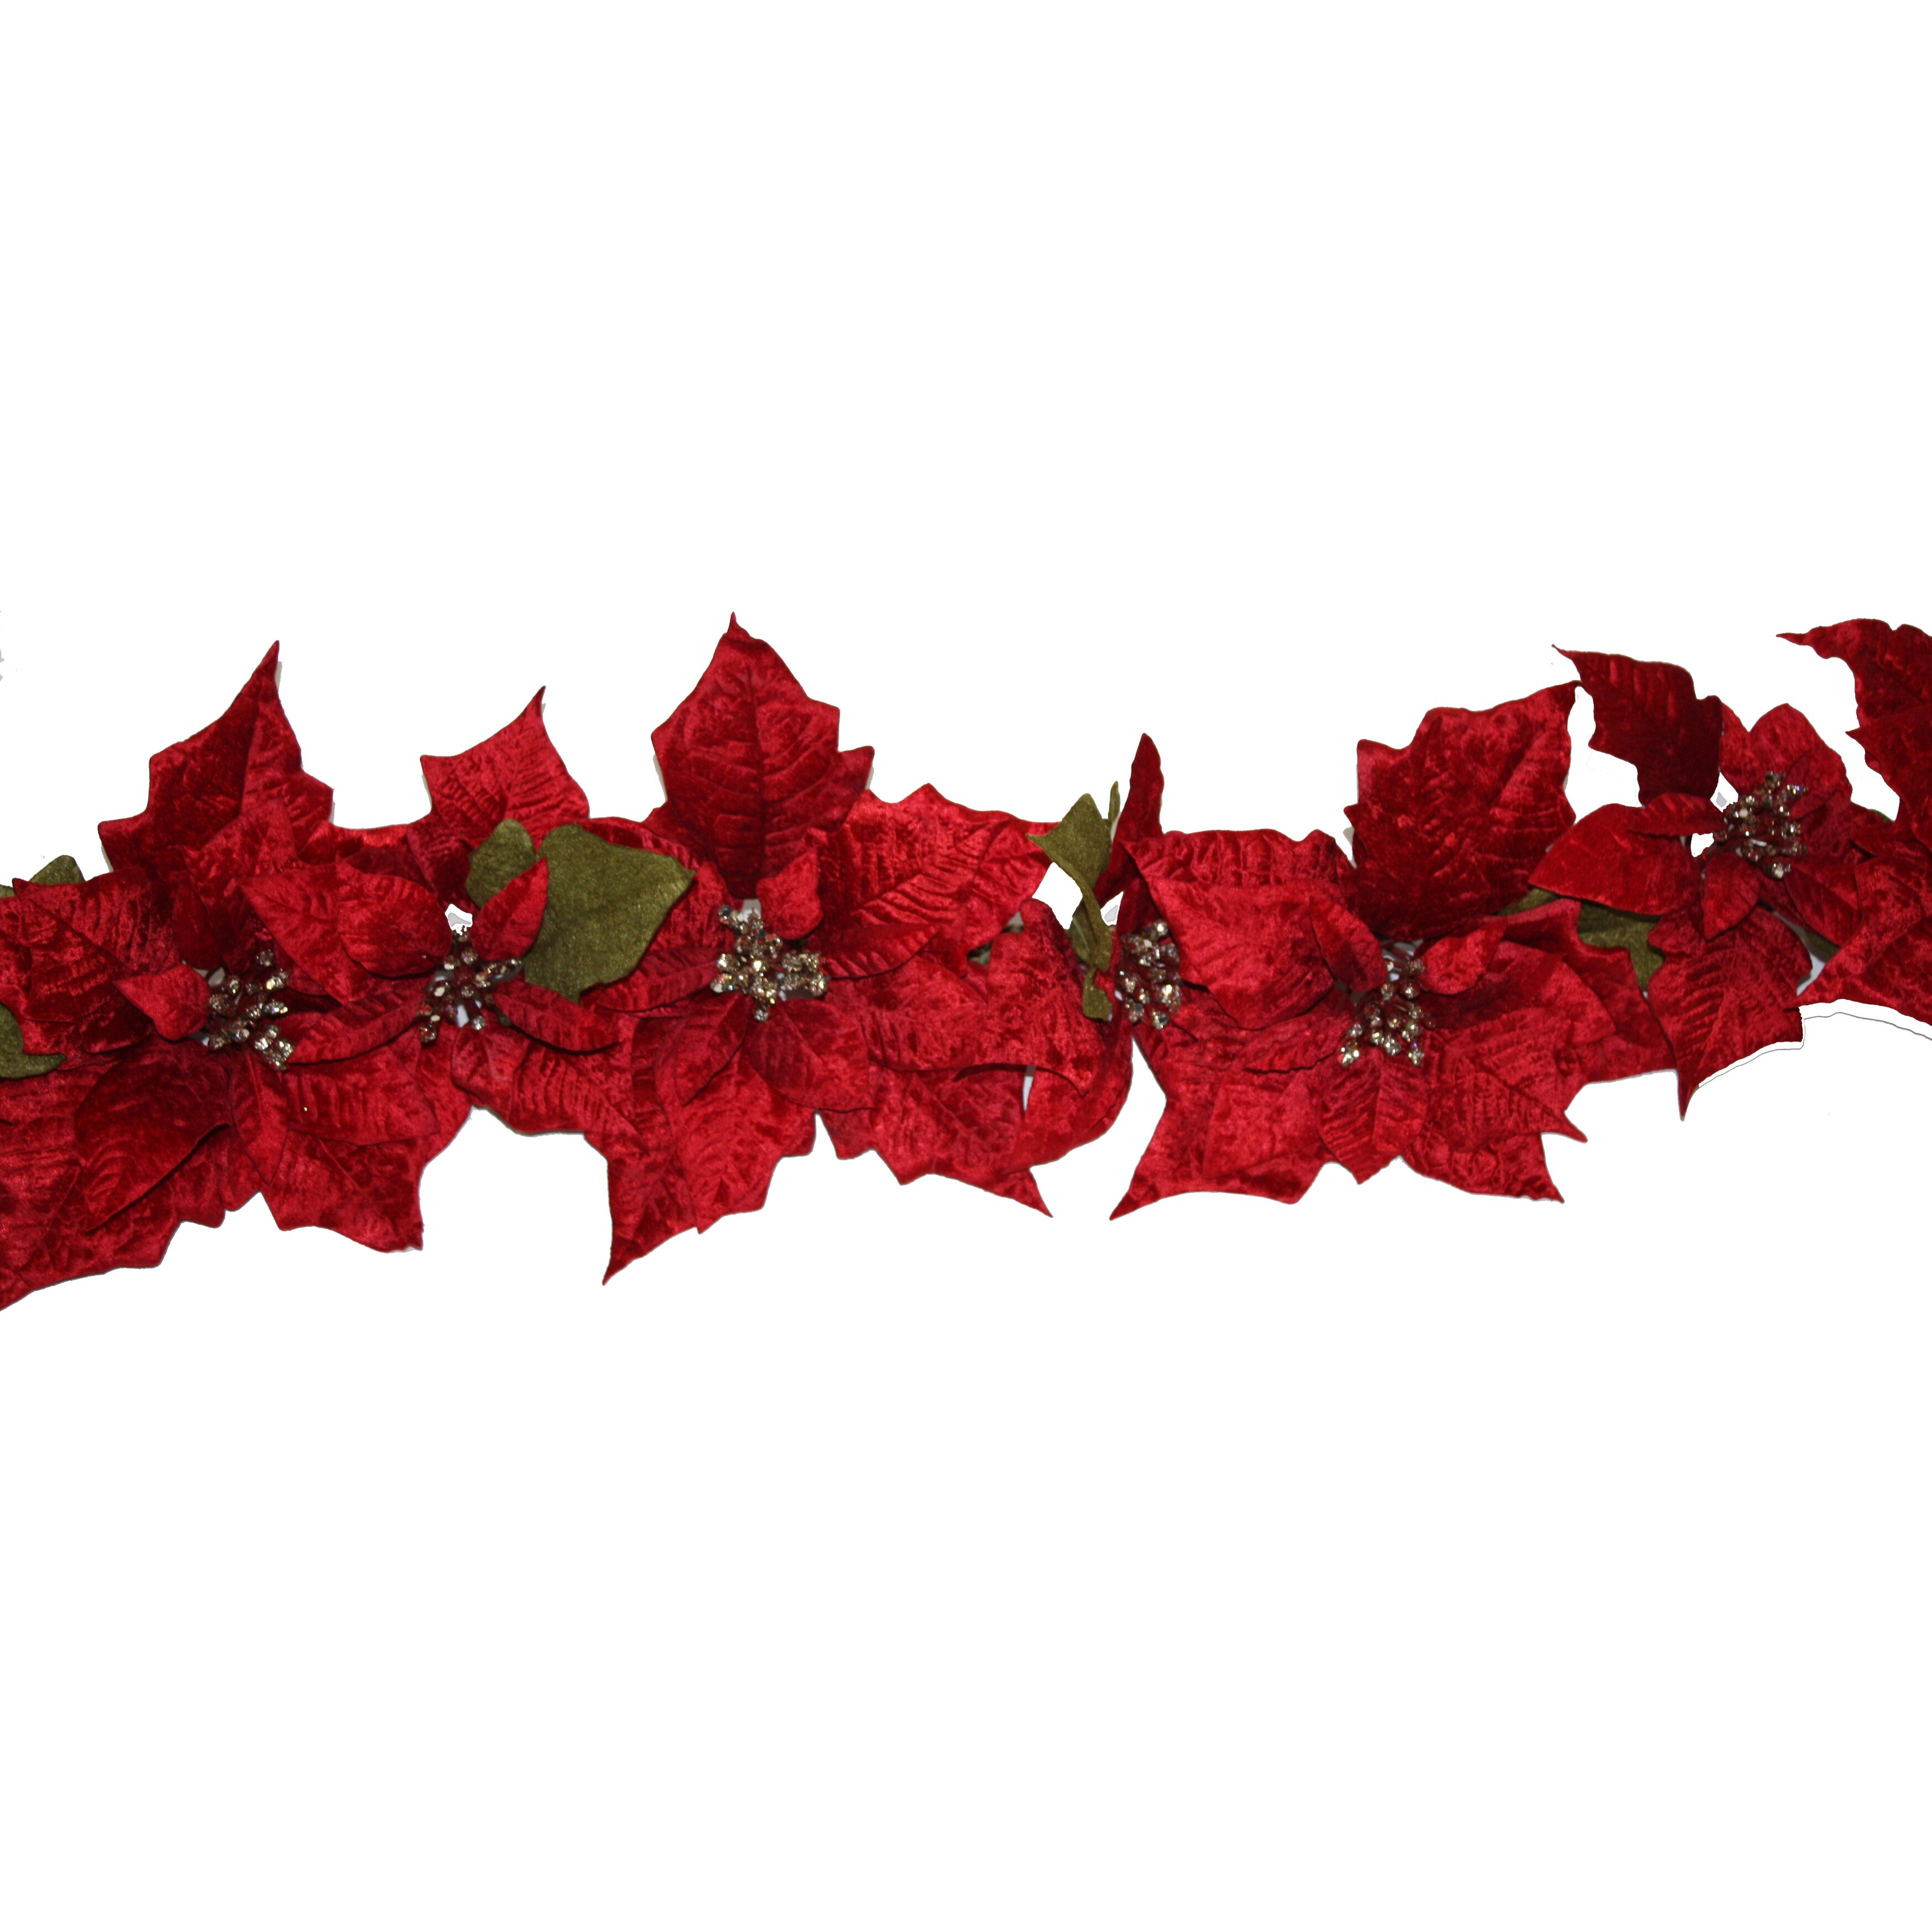 Dyno Seasonal Solutions Christmas Poinsettia Garland